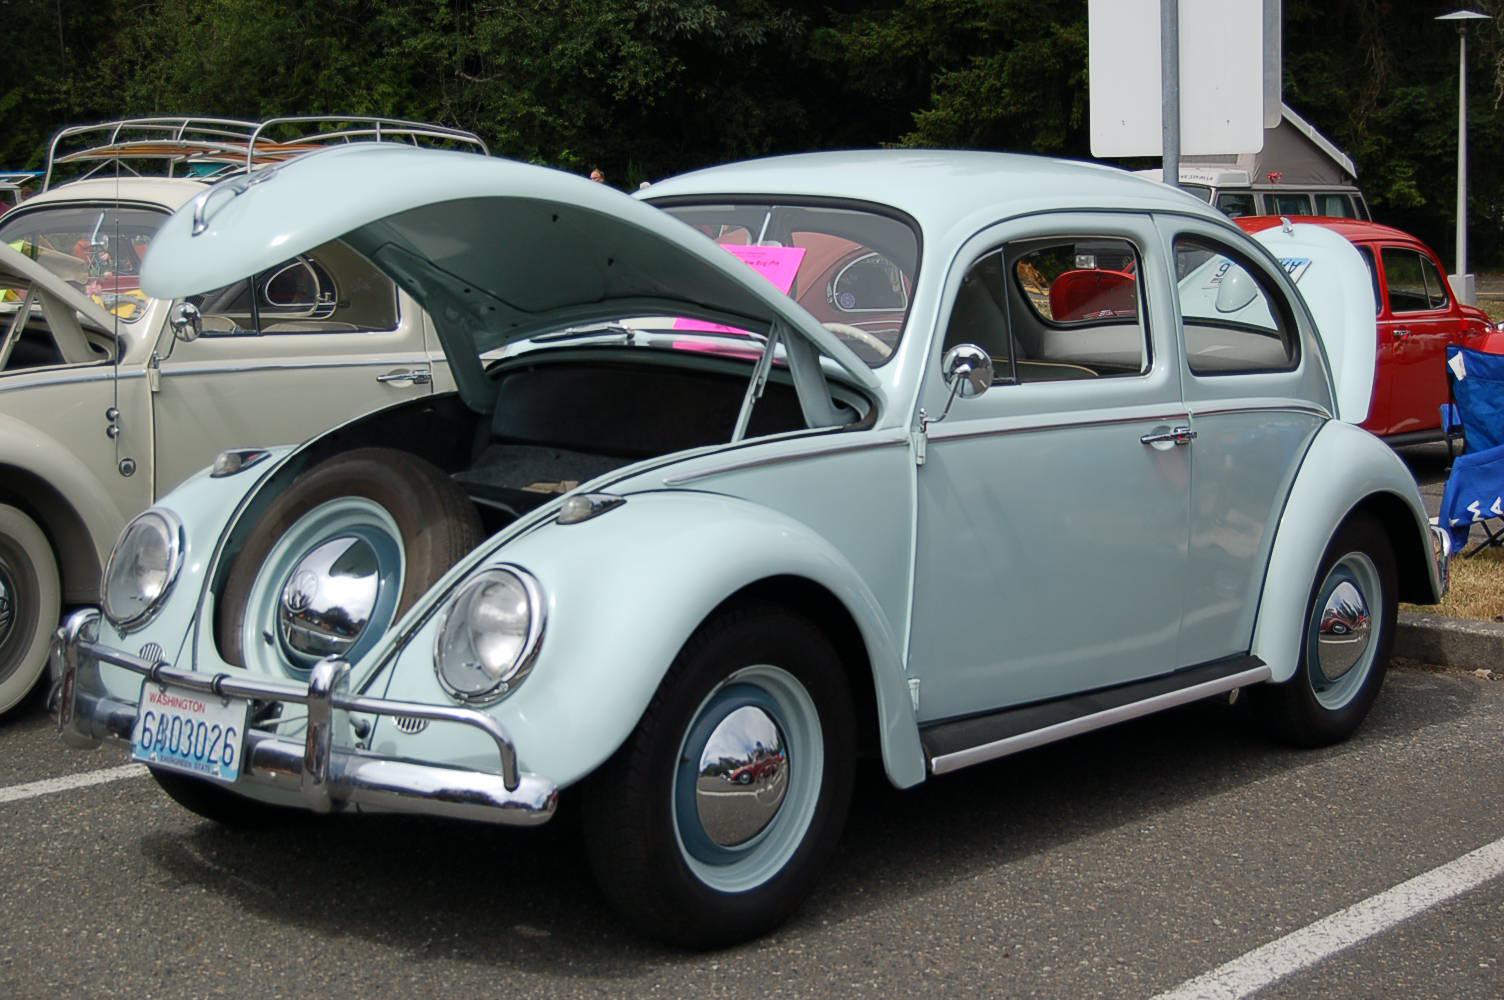 beetle volkswagen bestongas gls gas best tdi fuel bugs com on efficient cars most